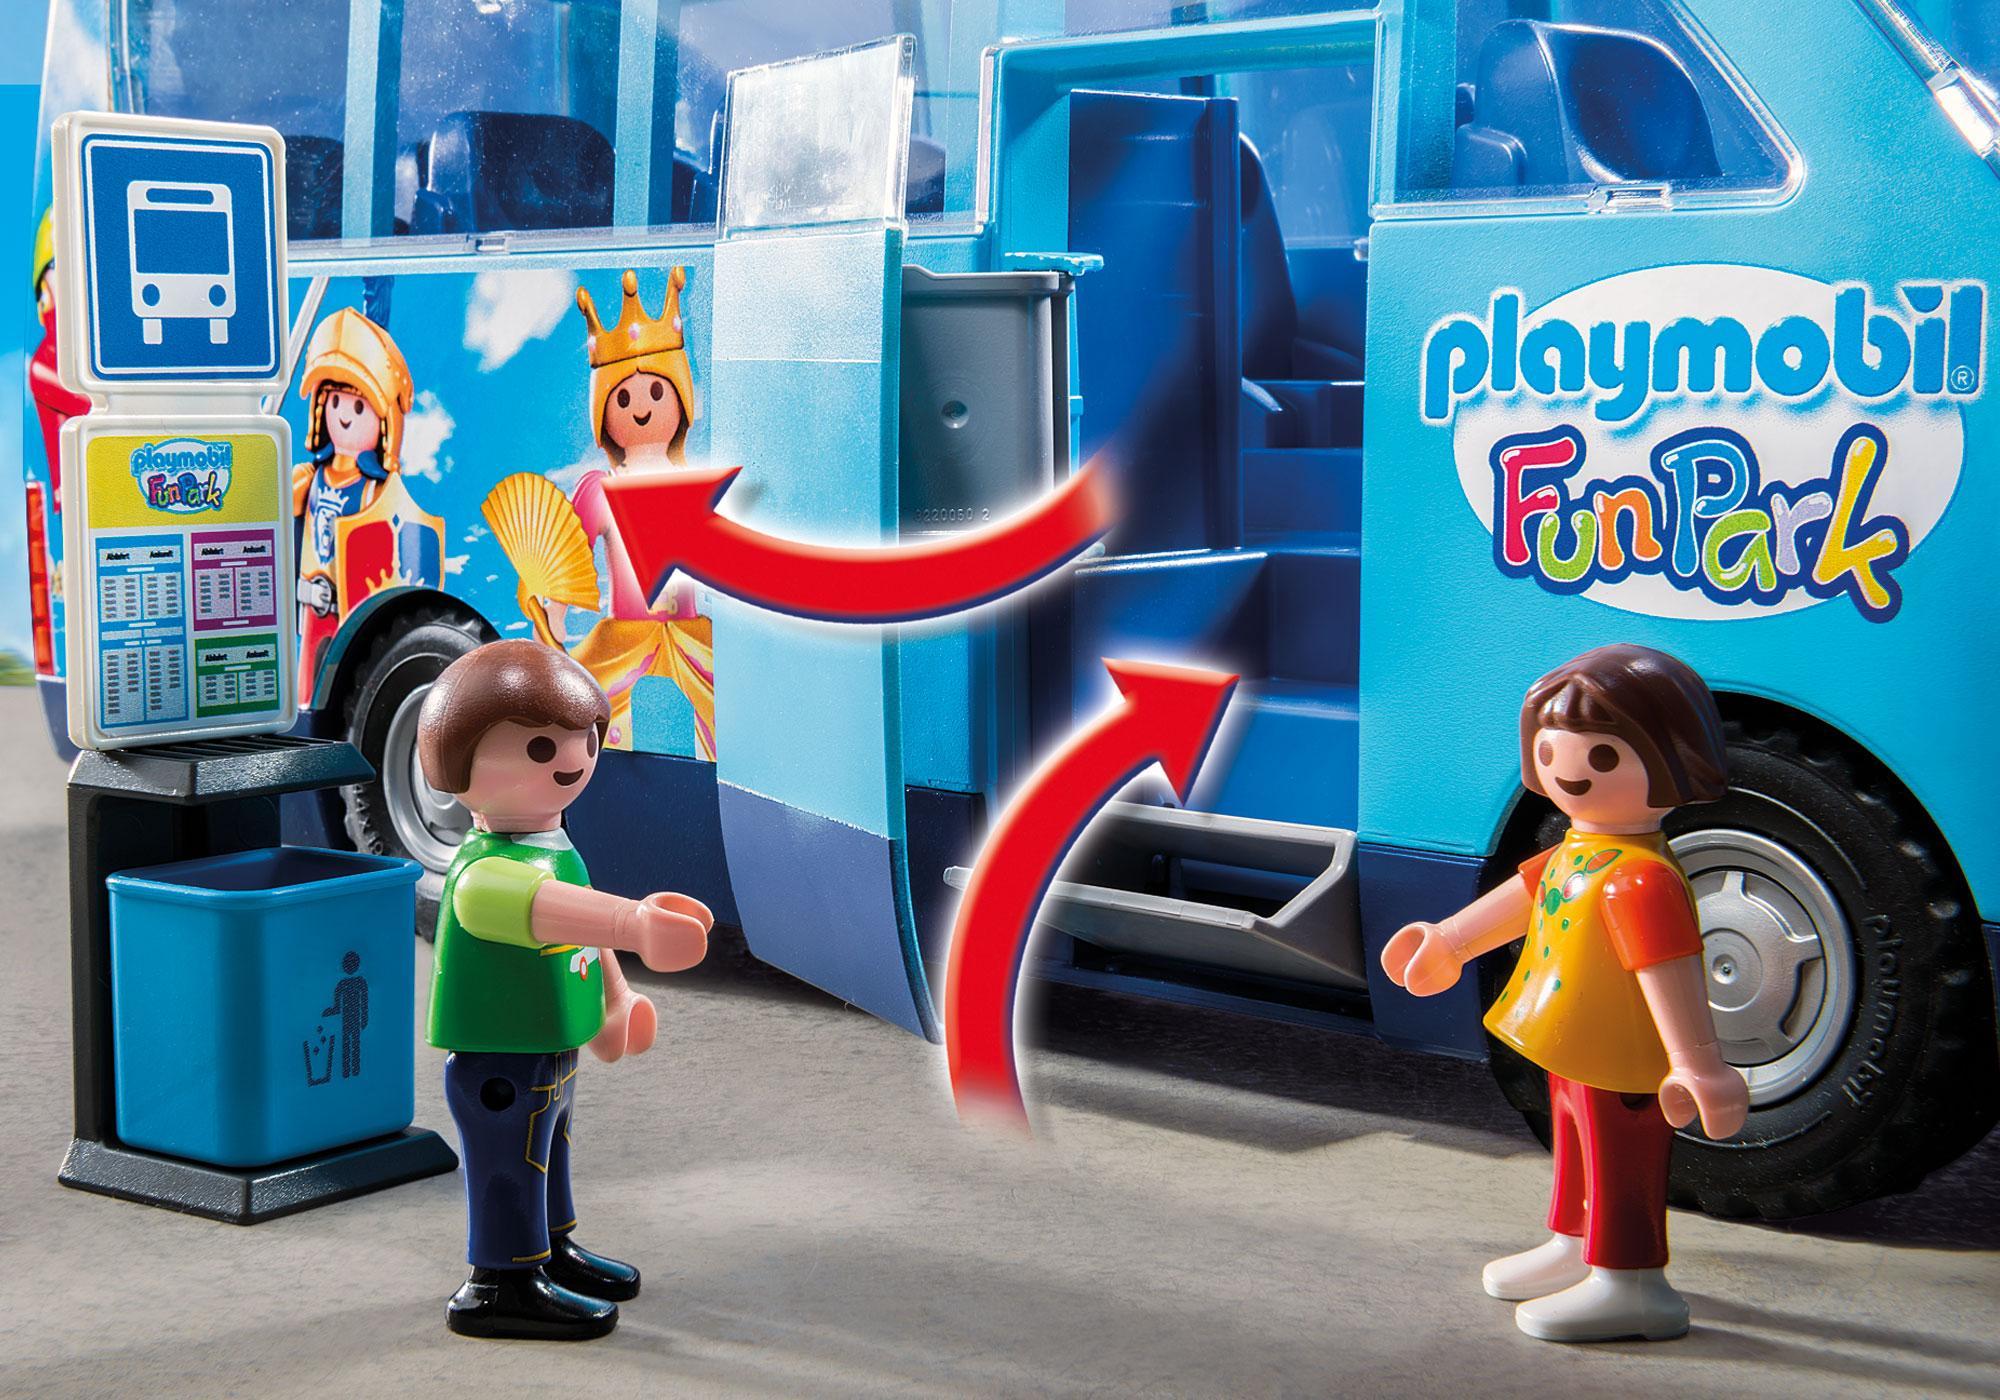 http://media.playmobil.com/i/playmobil/9117_product_extra1/PLAYMOBIL-FunPark Schulbus